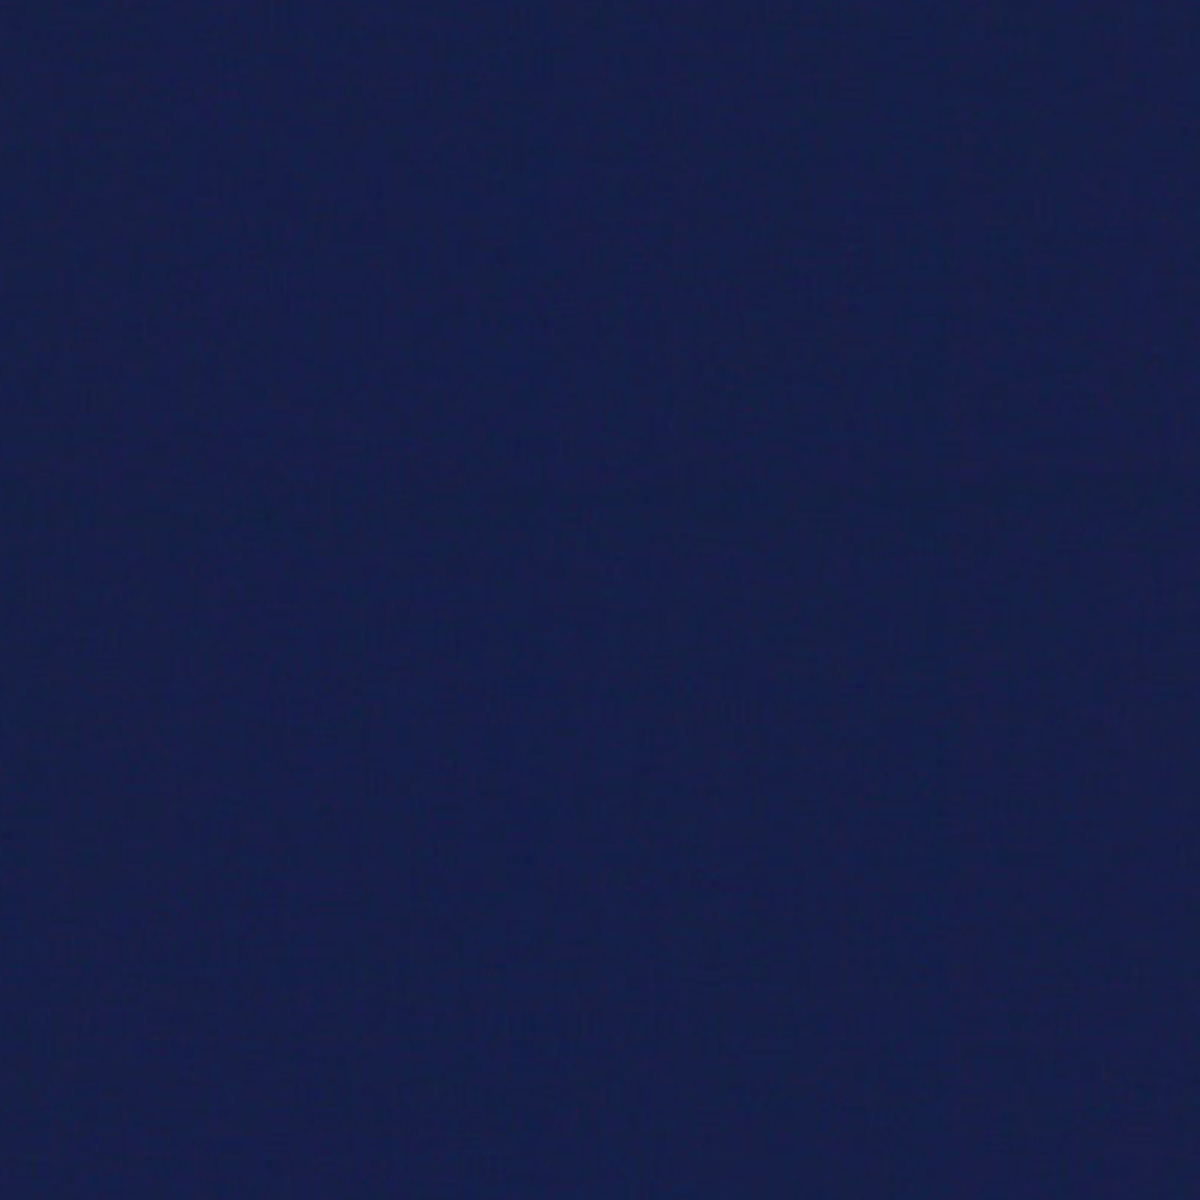 Uni-BlaugbRIEQxlh6kXe